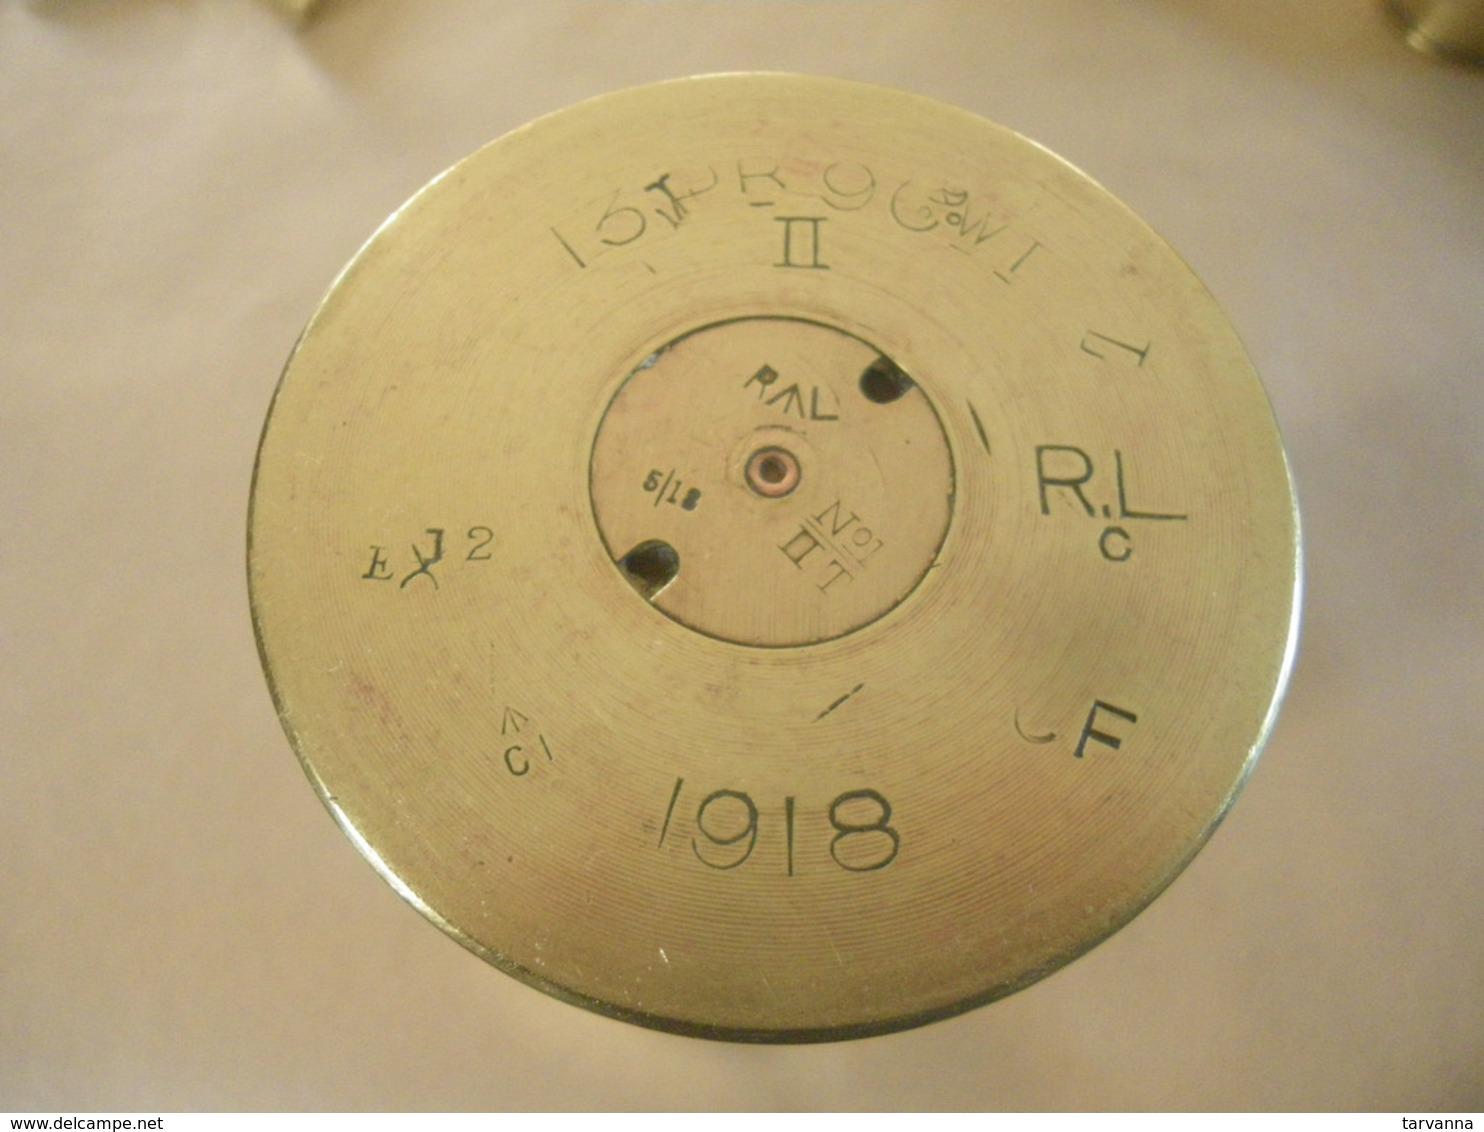 Douille Obus Britannique Ou Anglais 13 PR 9 CWT  1918 - Equipo